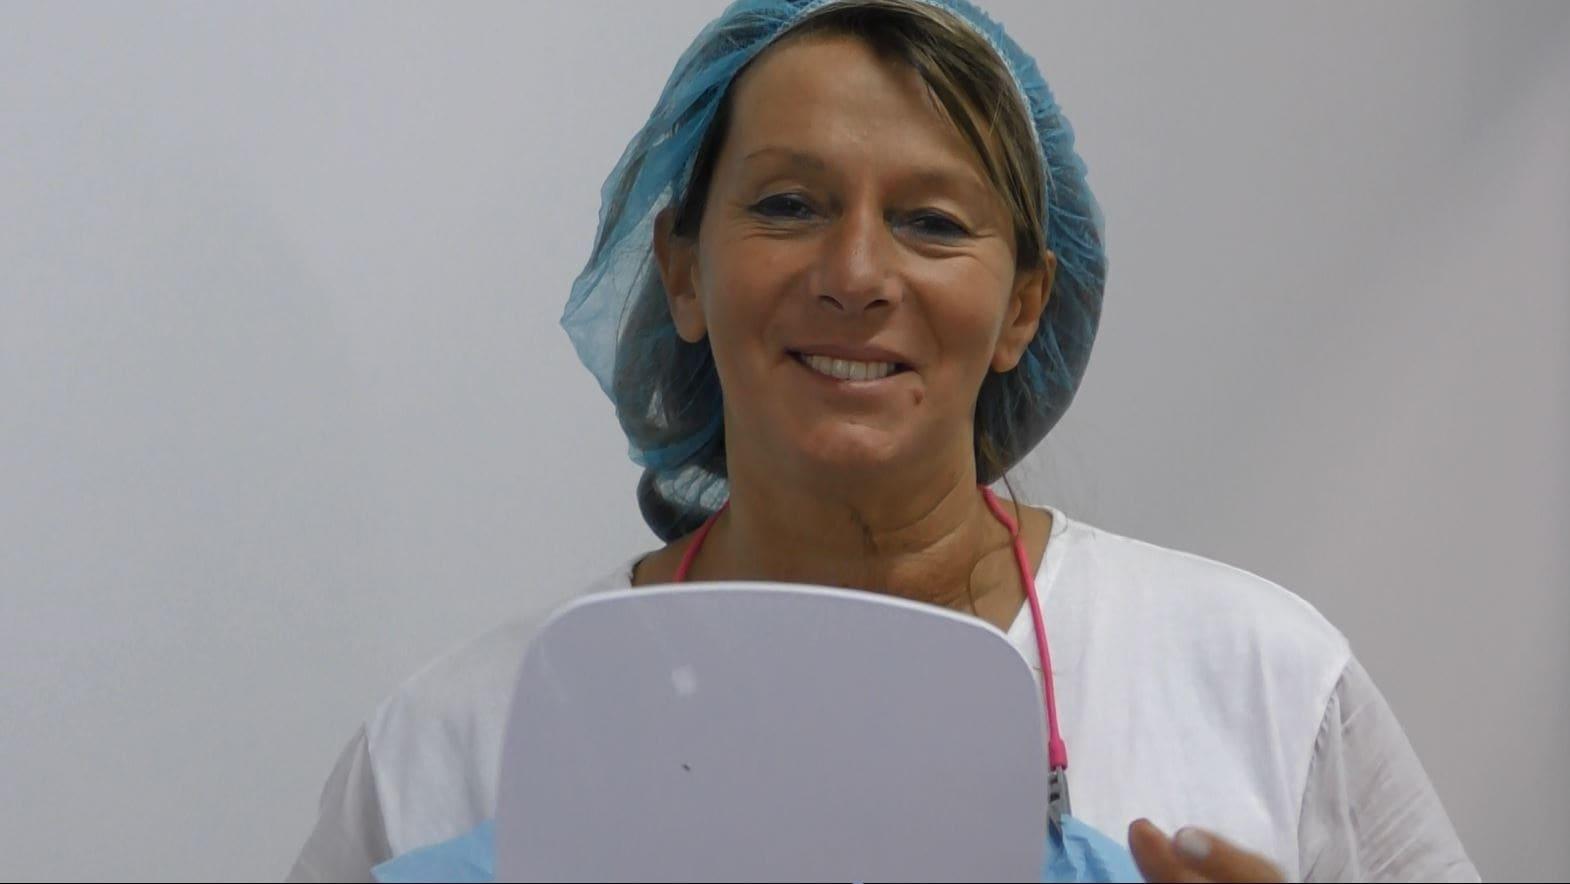 implantologia dentale firenze